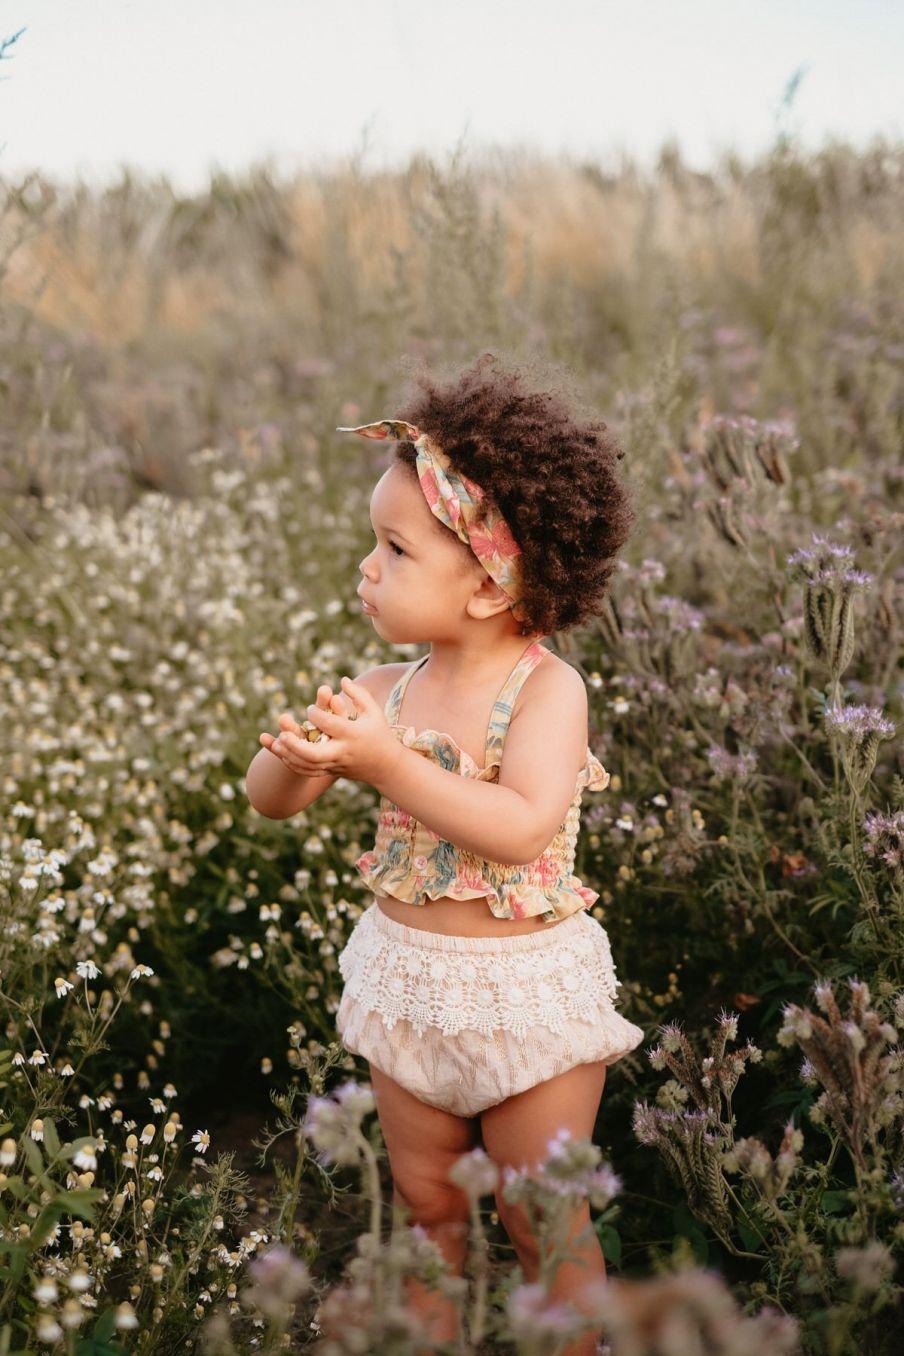 boheme chic vintage bloomer bébé fille mavaria blush psyche lurex